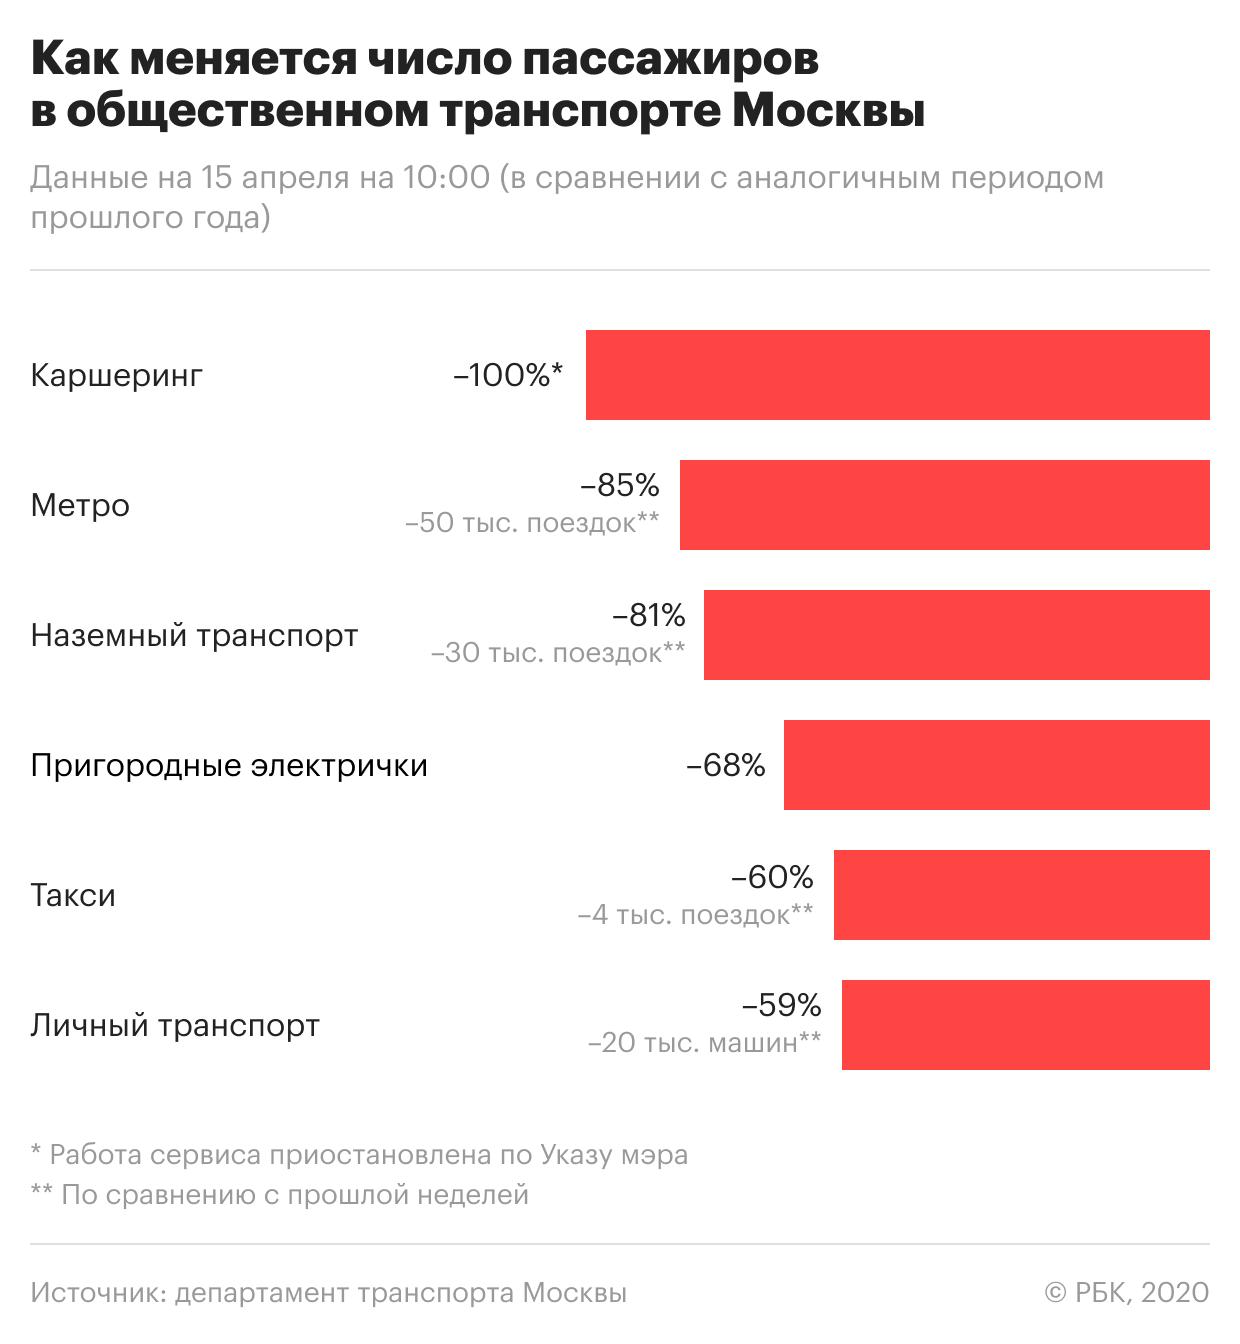 https://s0.rbk.ru/v6_top_pics/media/img/3/08/755869423929083.png